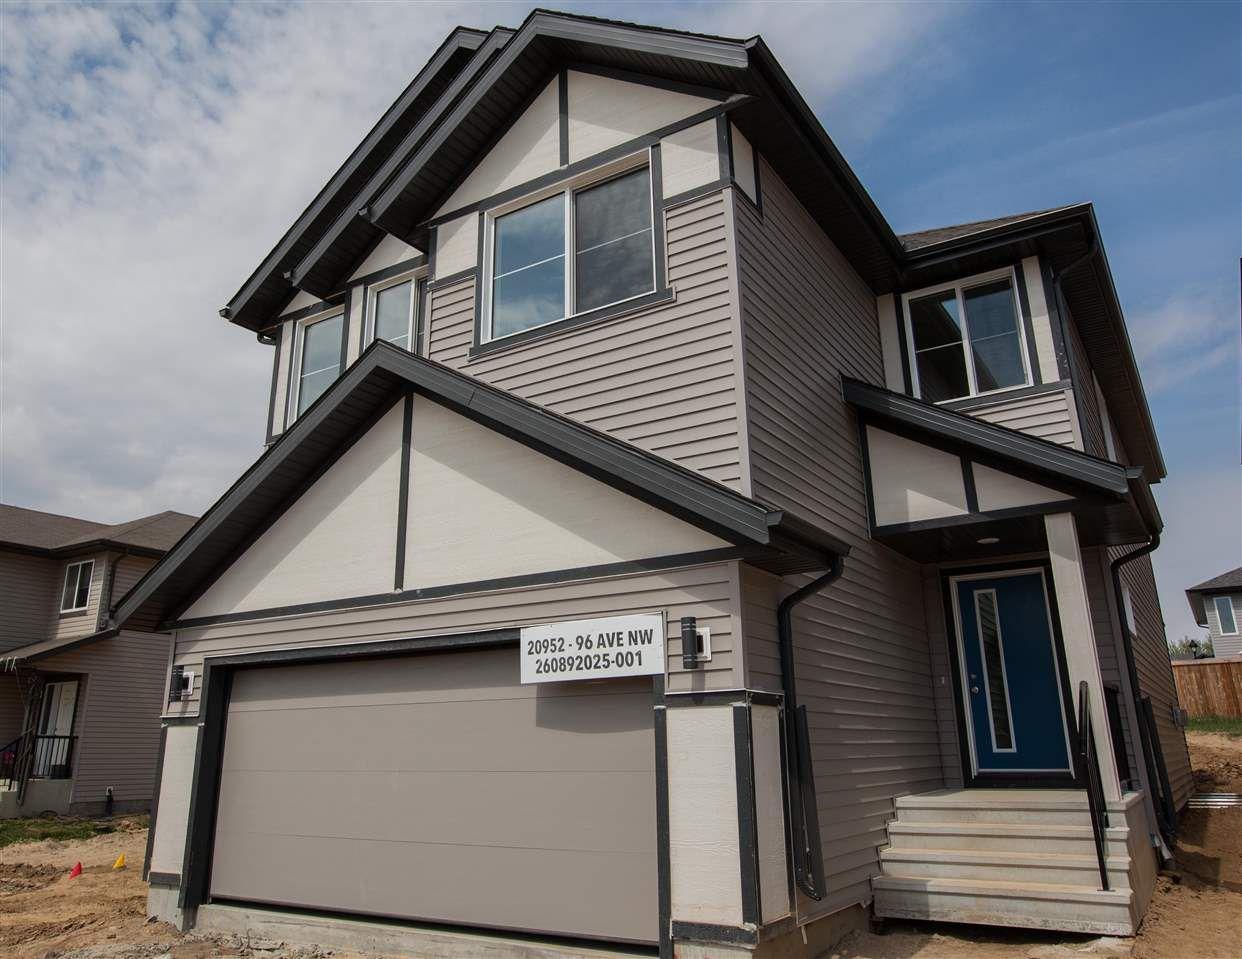 Main Photo: 20952 96 Avenue in Edmonton: Zone 58 House for sale : MLS®# E4156598